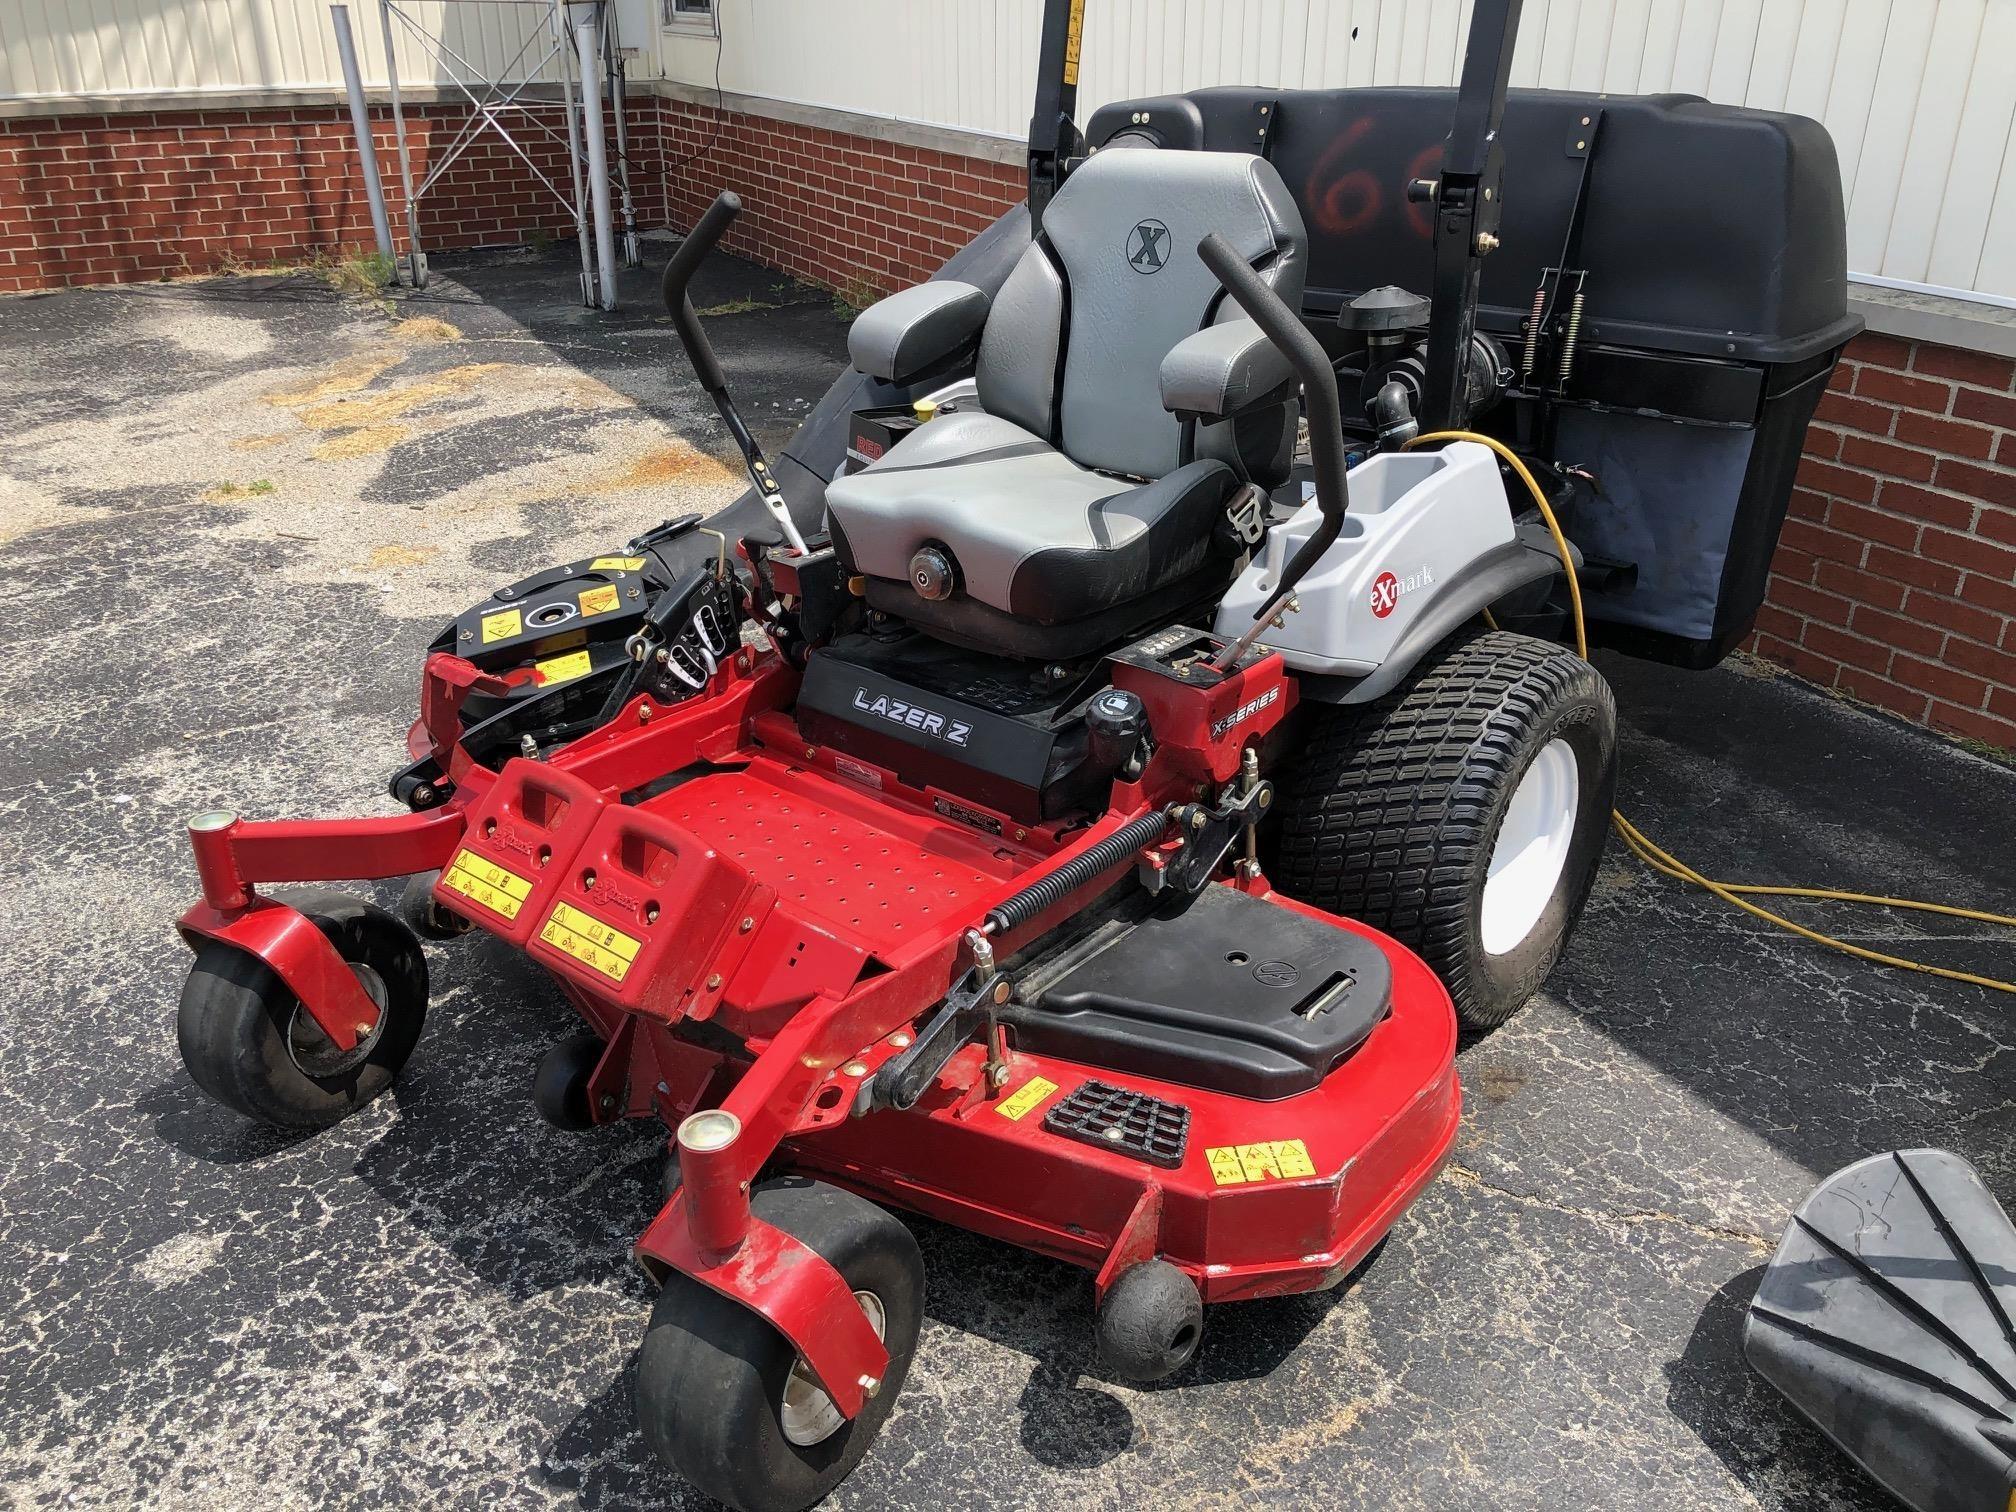 2018 Exmark LZX940EKC606W0 Lawn and Garden